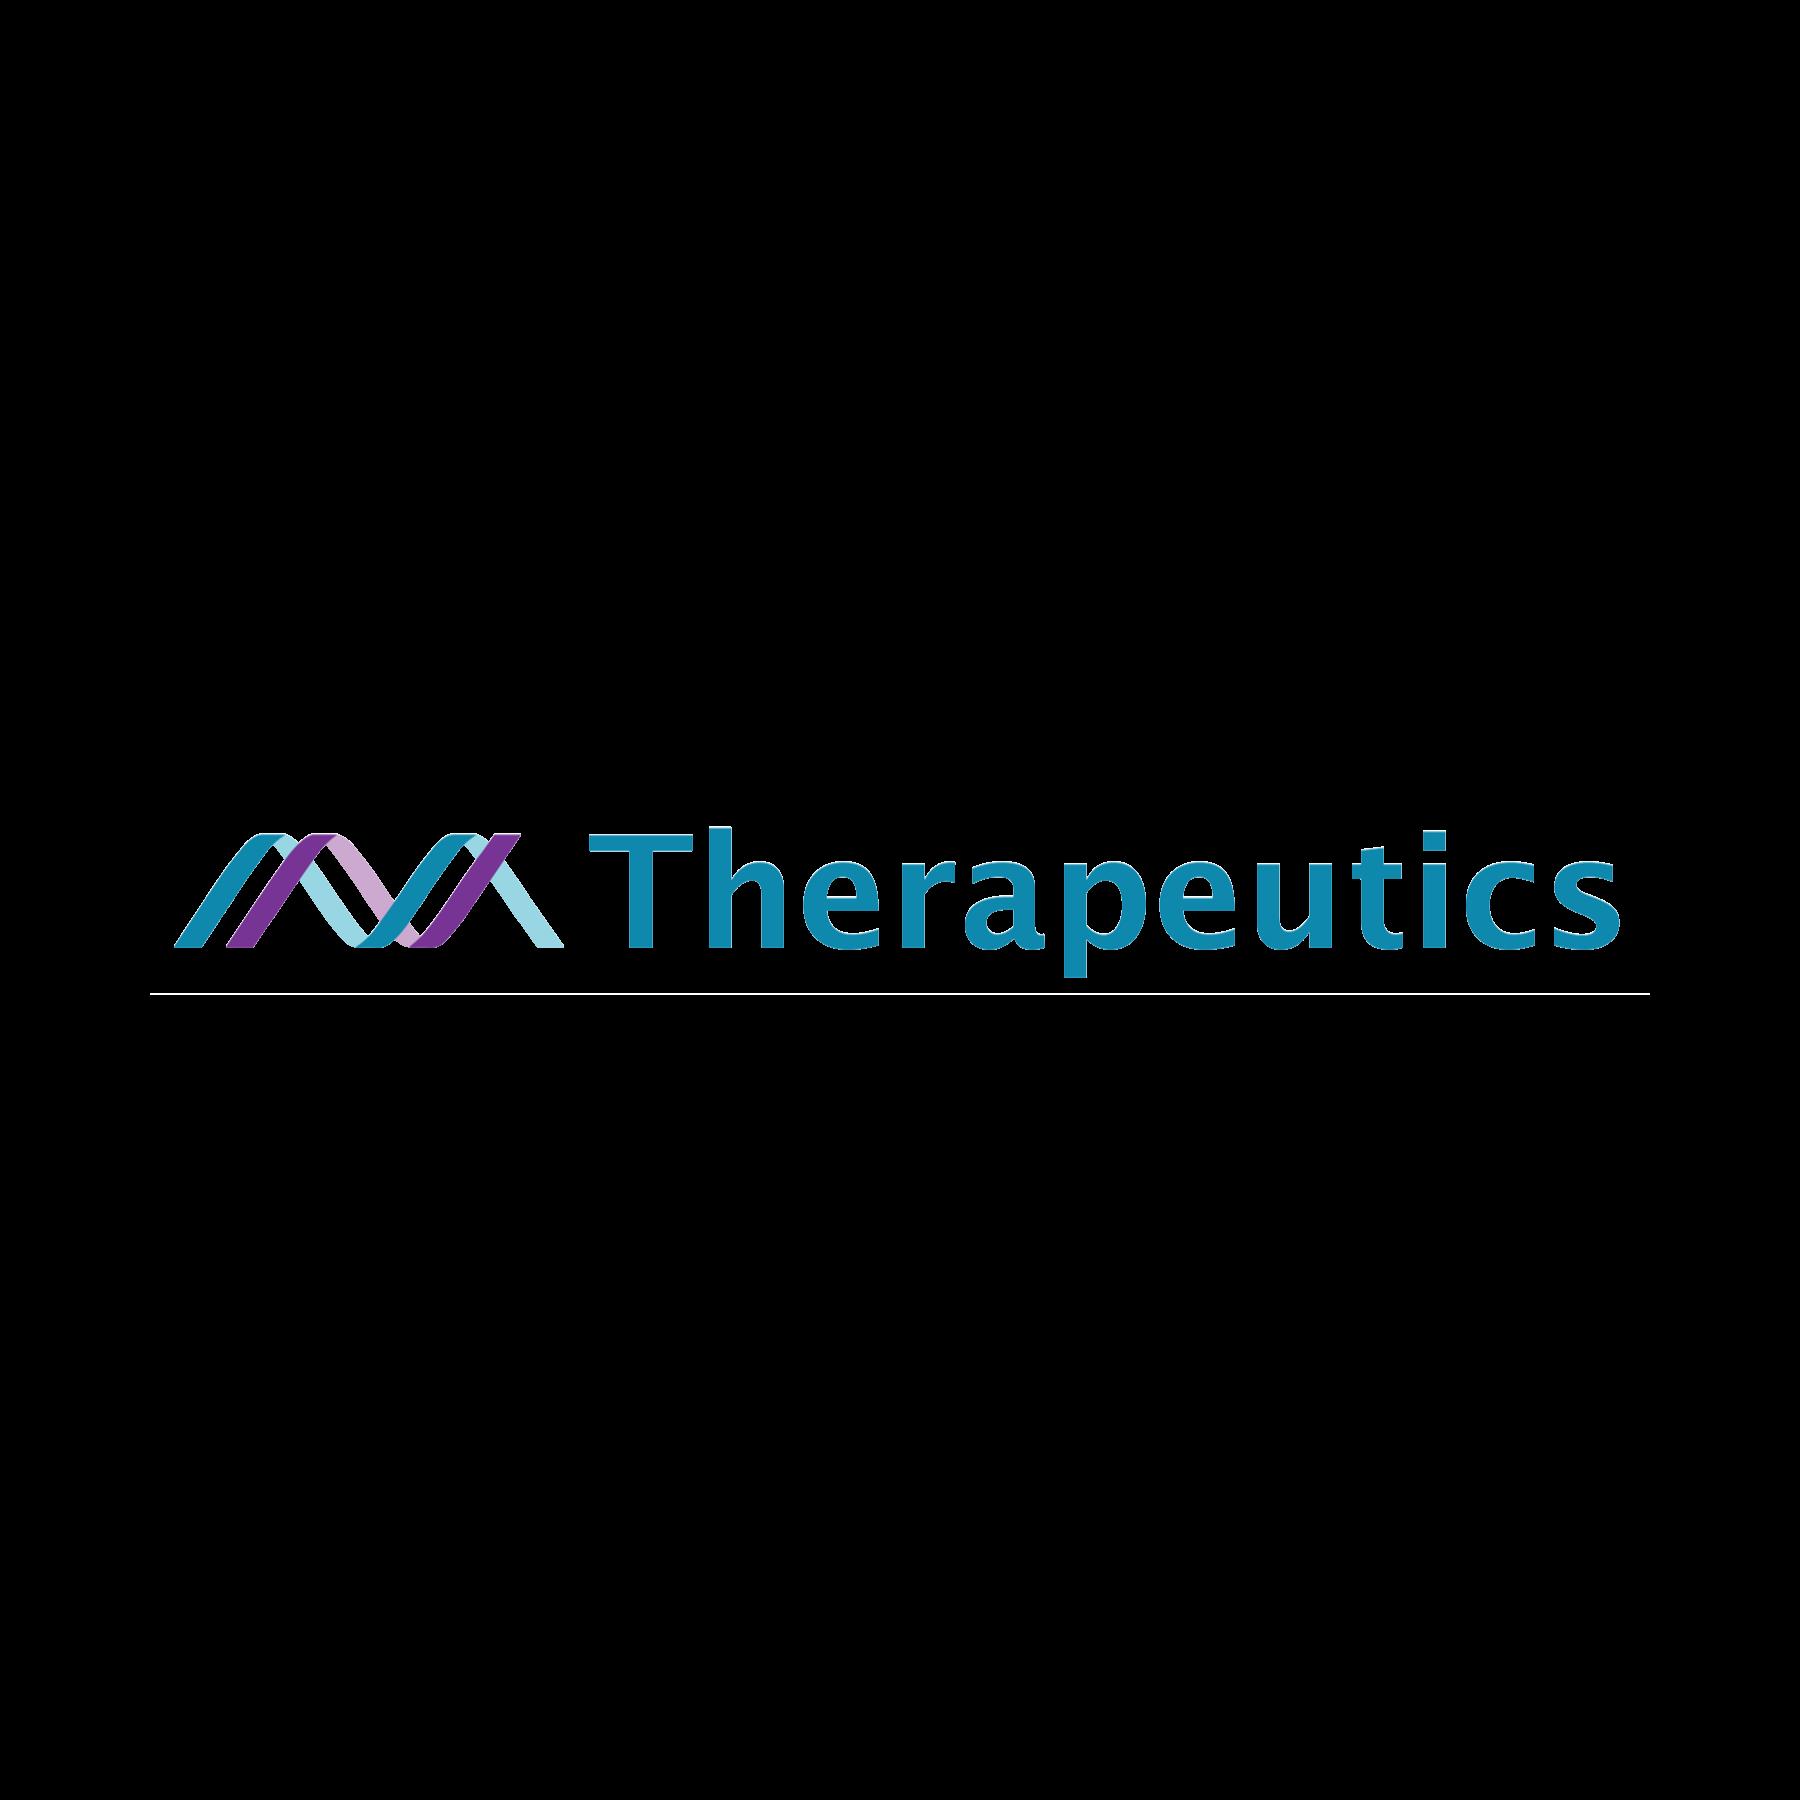 ANA Therapeutics